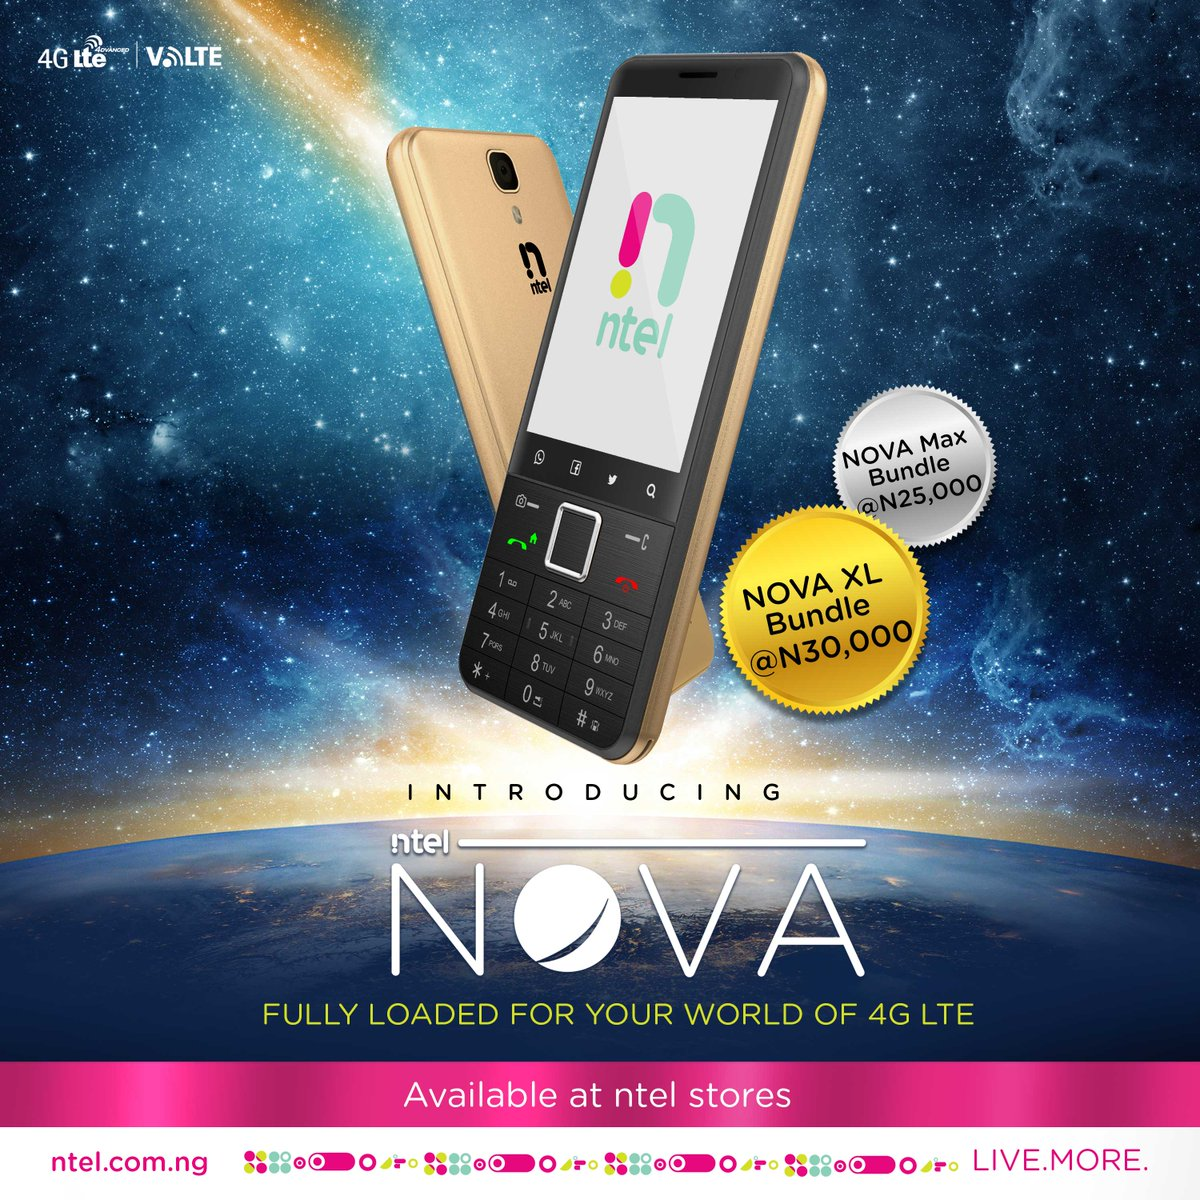 Get an ntel NOVA phone and enjoy the most advanced 4G network in Nigeria #ntelNOVA #VoLTE #4G   http://www. ntel.com.ng  &nbsp;  <br>http://pic.twitter.com/PYYCdNZHRo